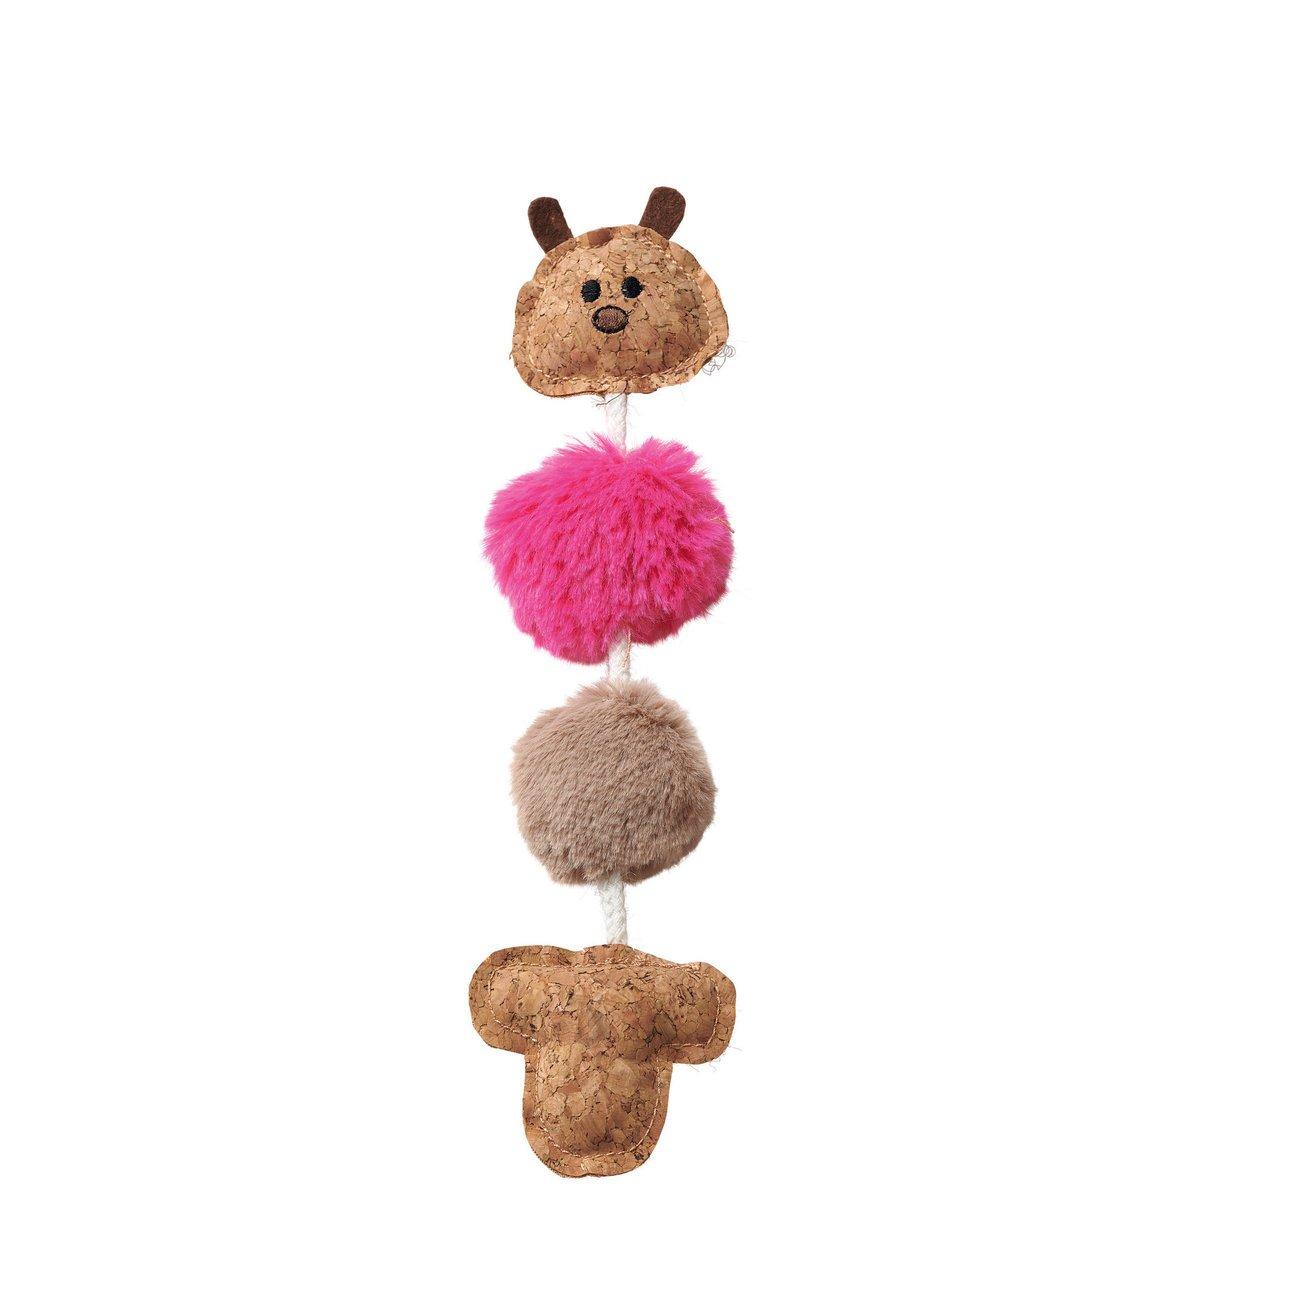 Hunter Katzenspielzeug Moa, Bär, 26 cm